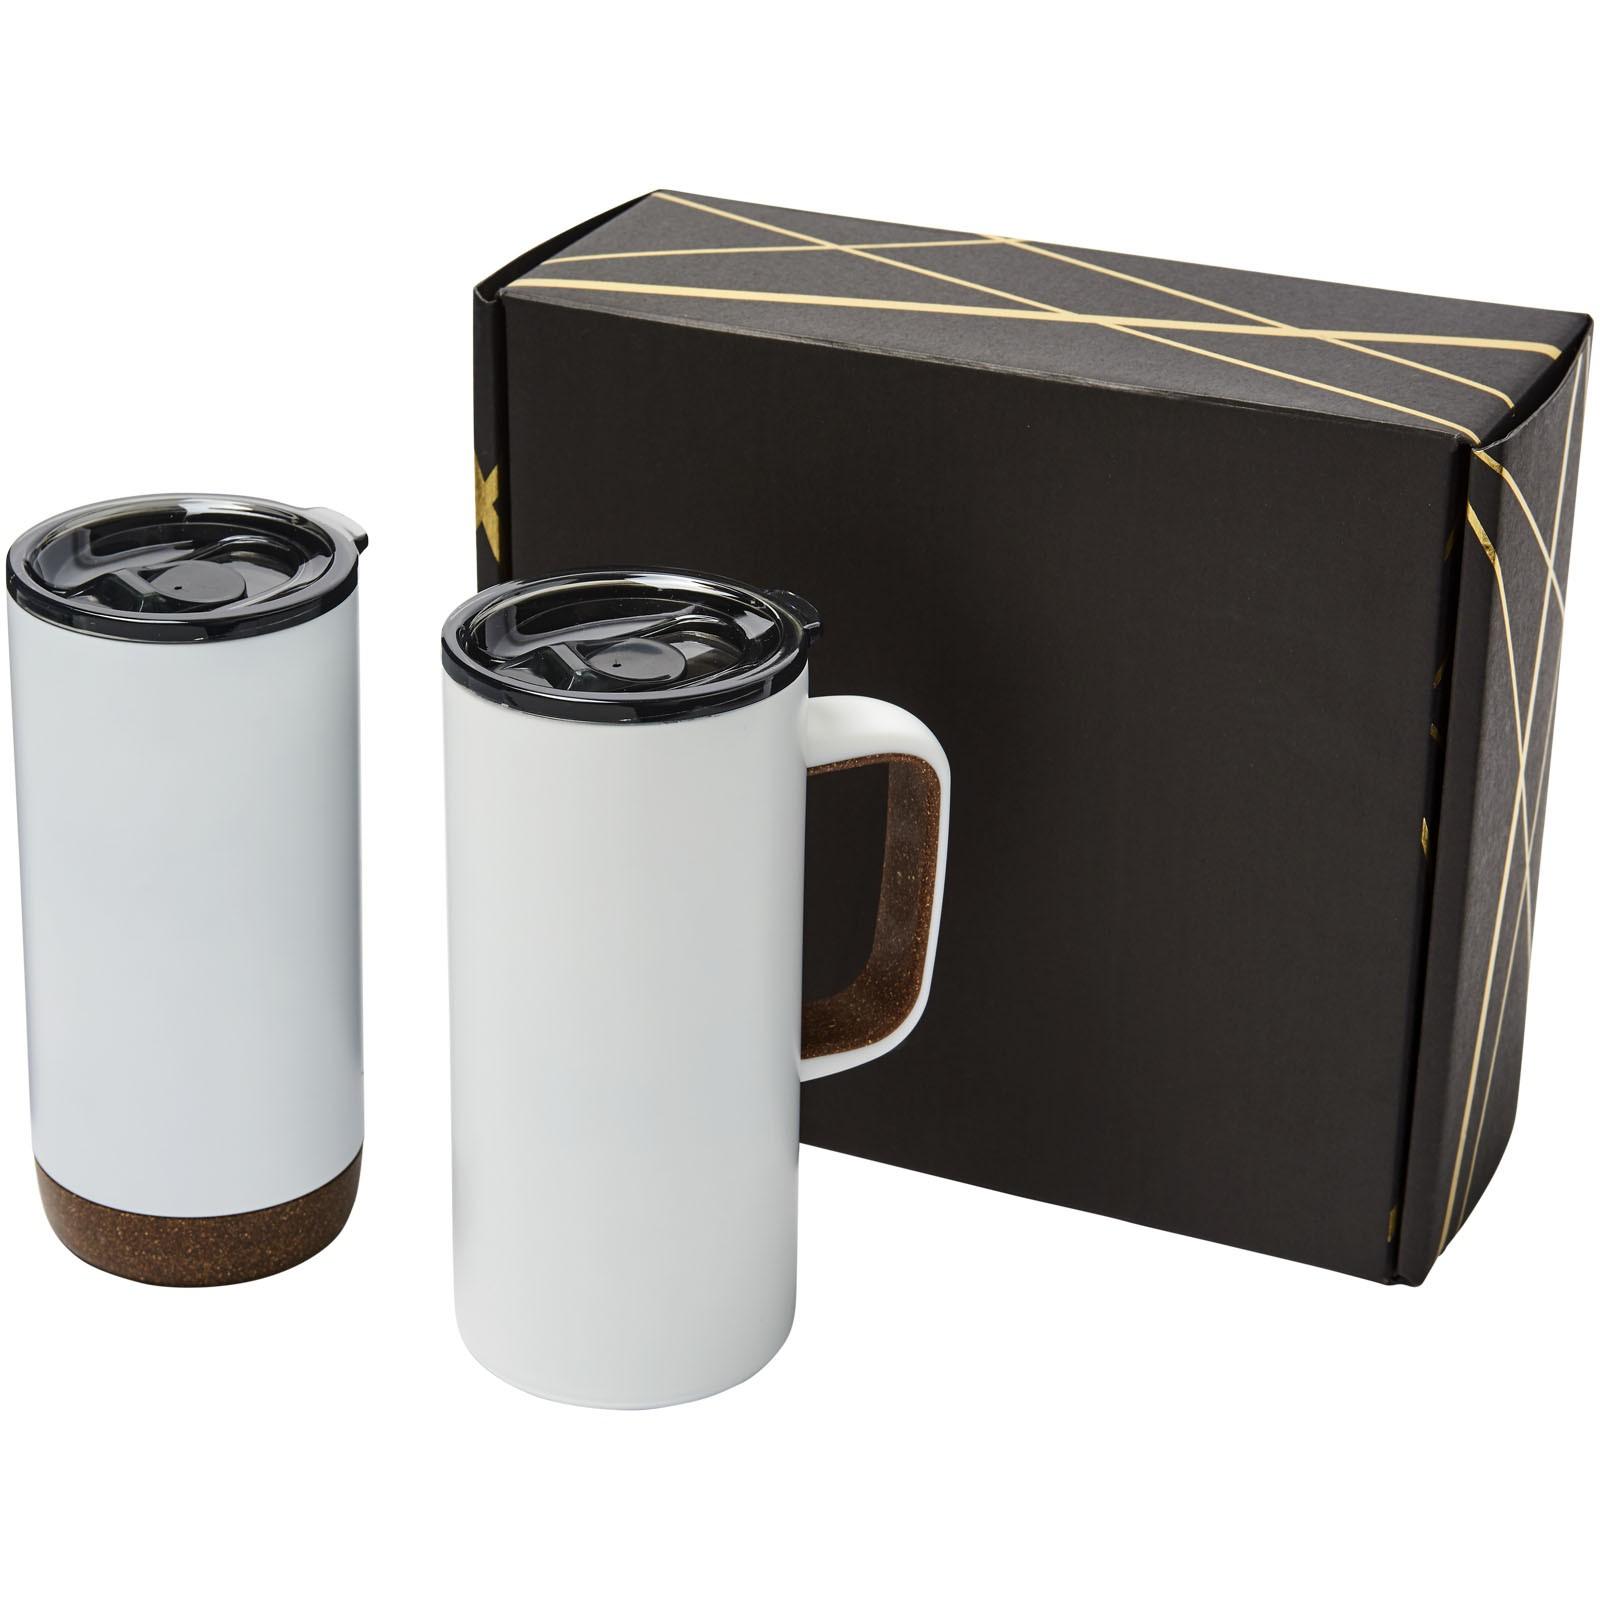 Valhalla mug and tumbler copper vacuum gift set - White